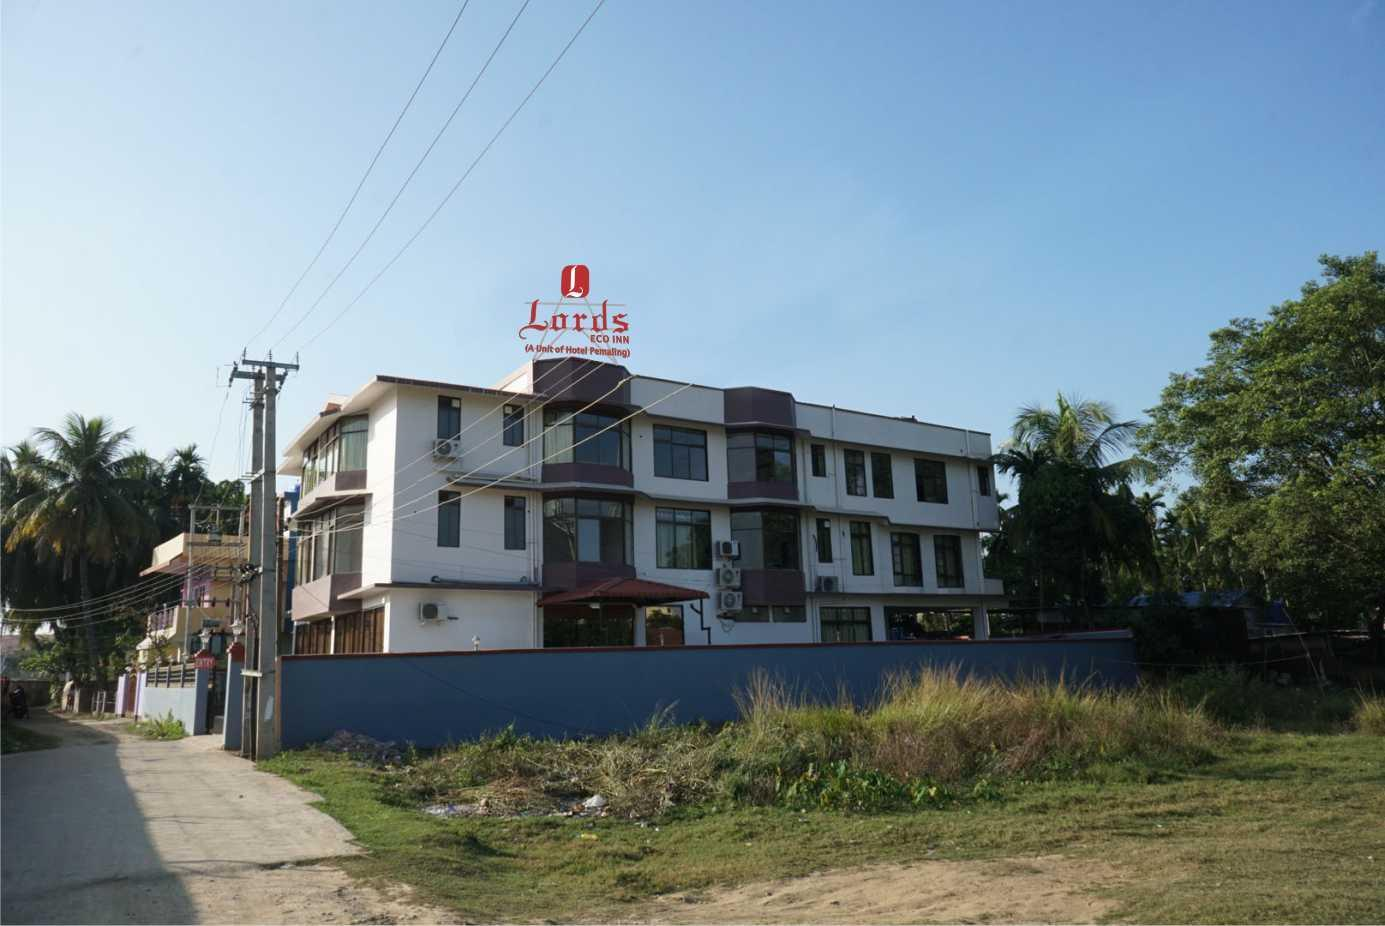 Lords Eco Inn Guwahati